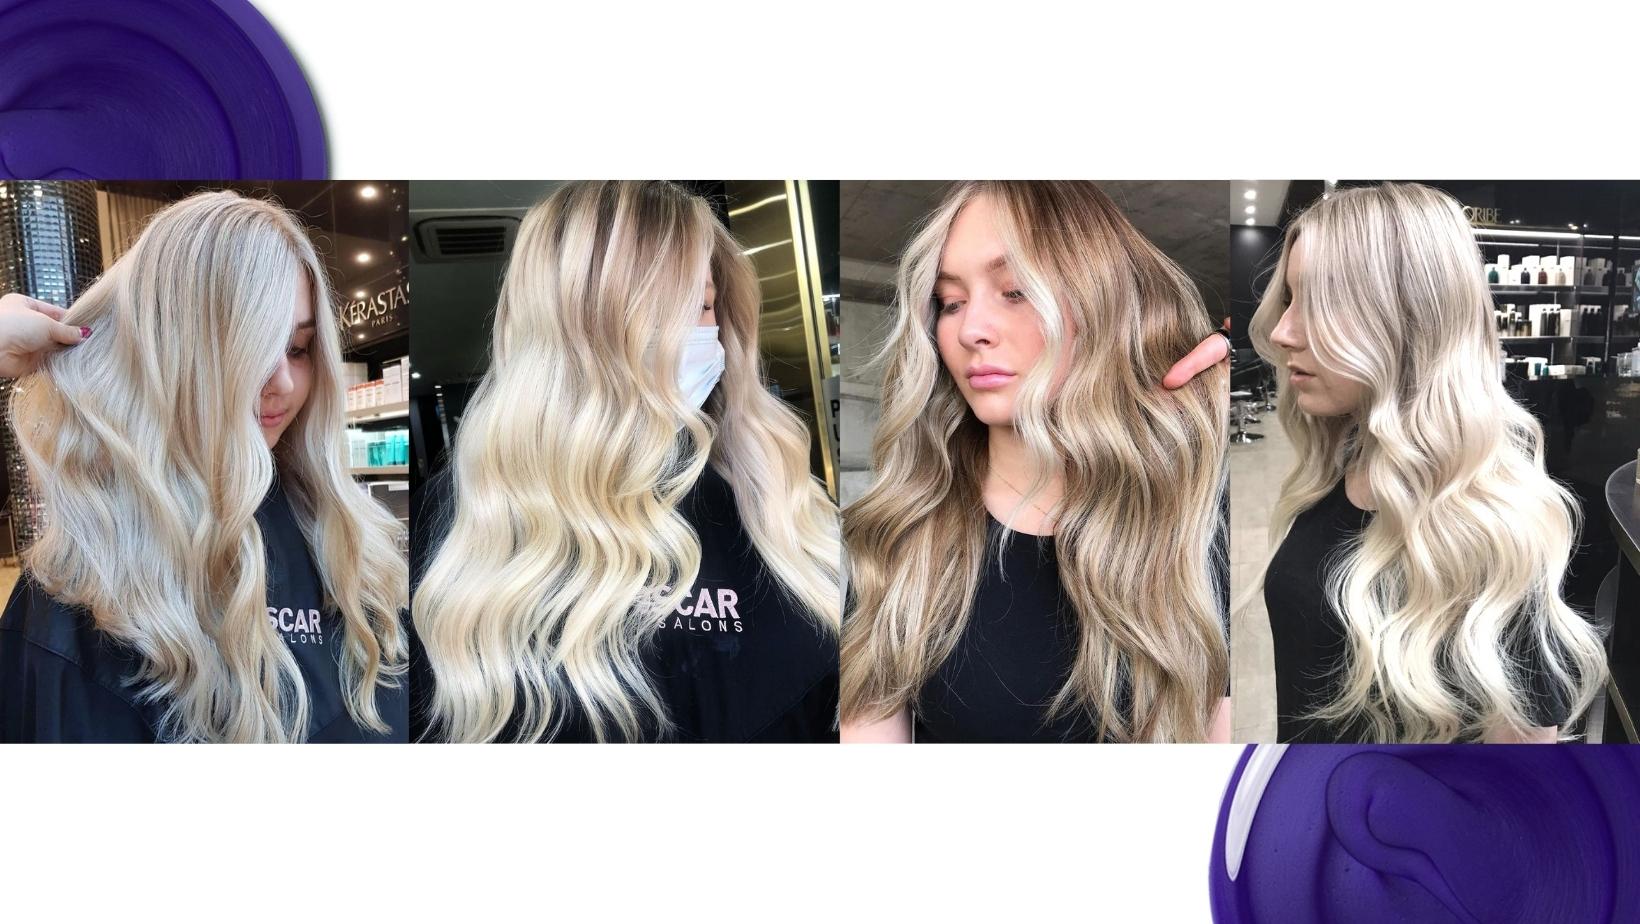 blonde hair girls